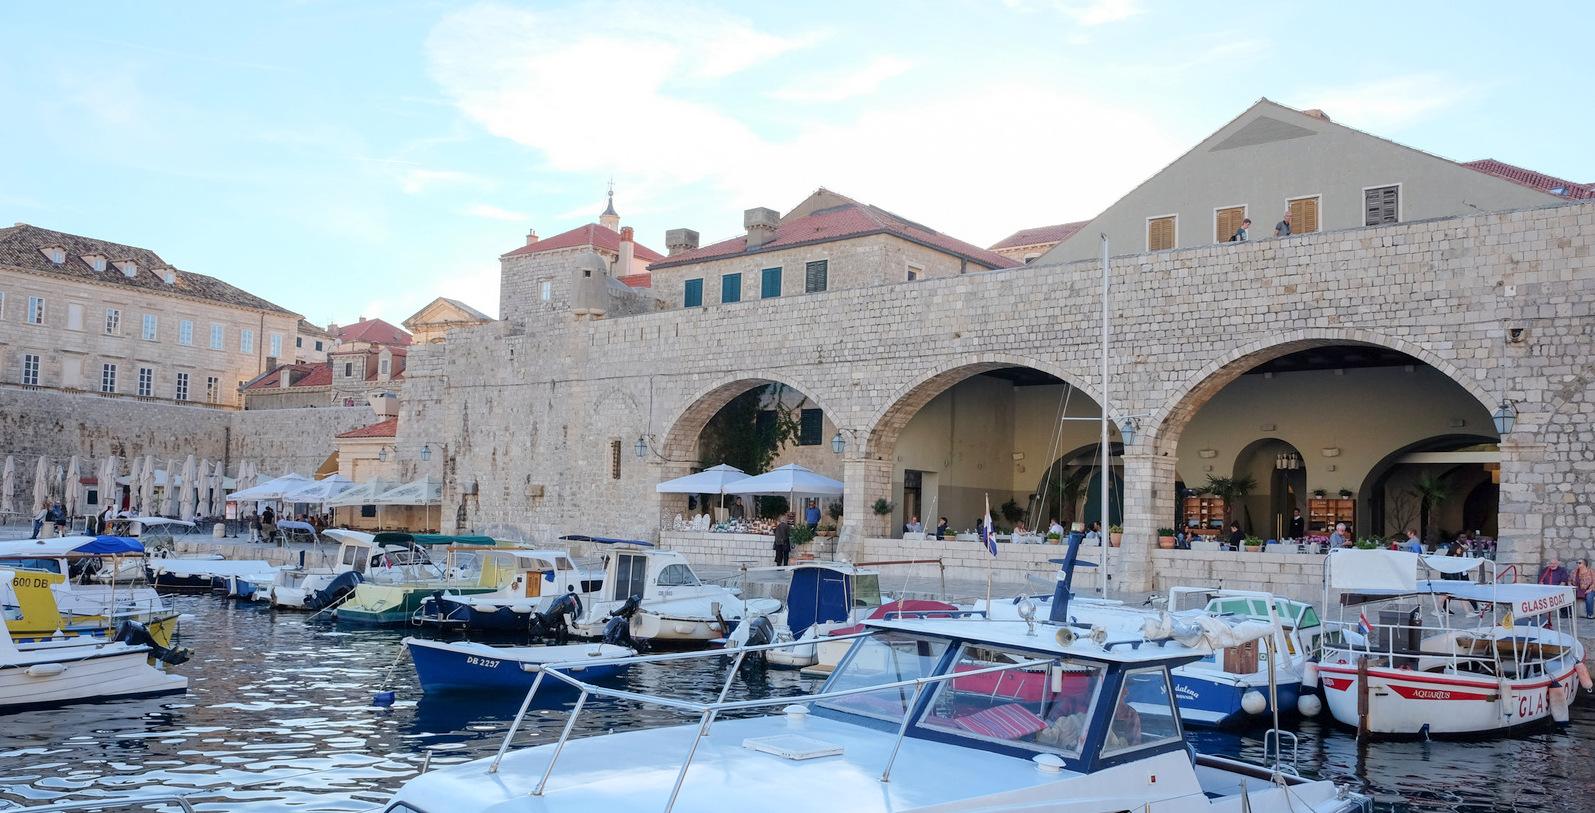 Arsenal, Dubrovnik, Croatia